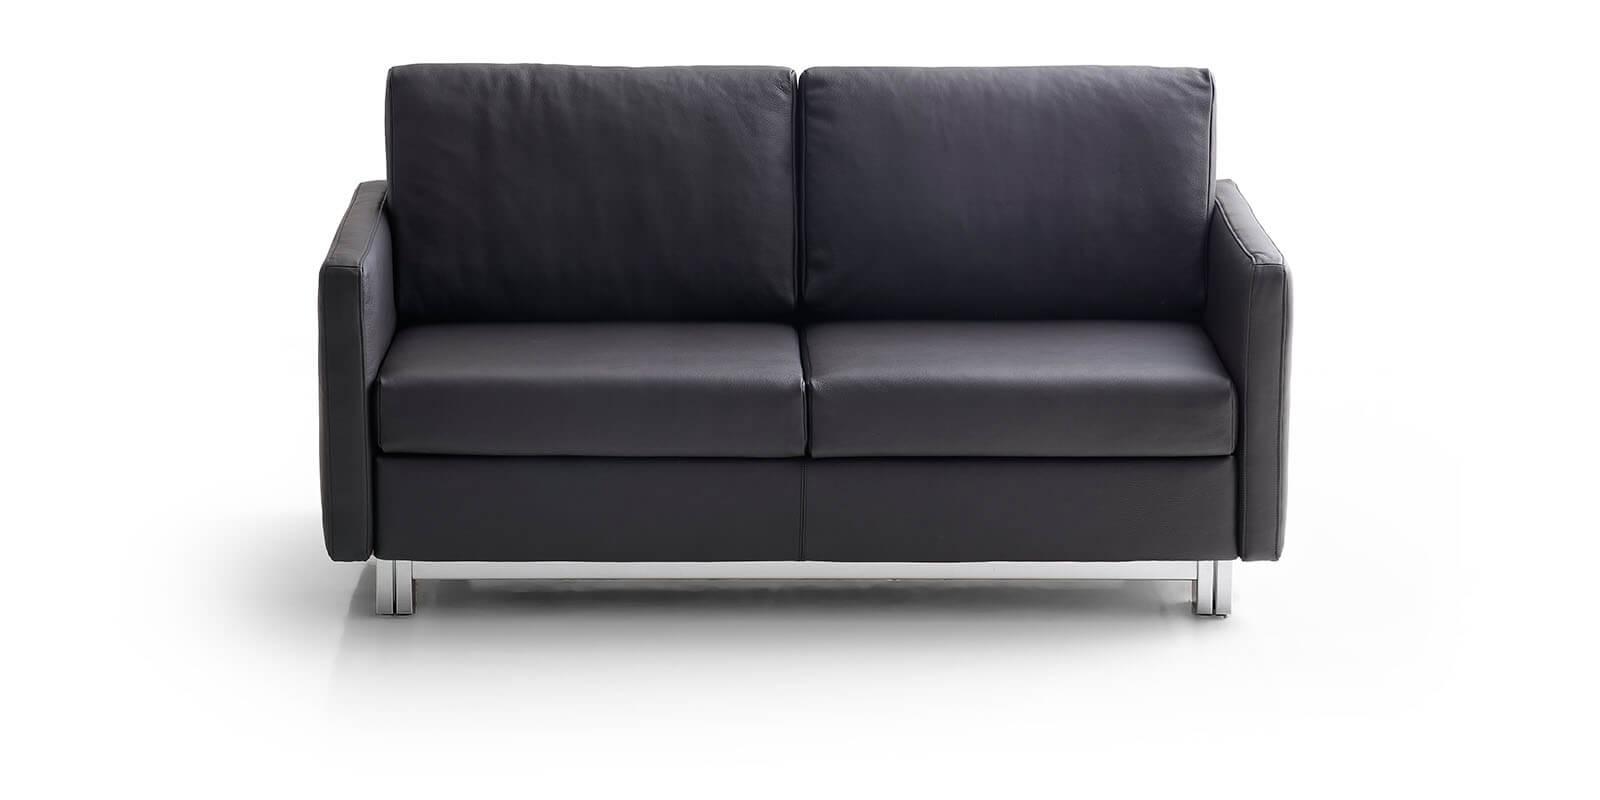 schlafsofa cubismo von franz fertig. Black Bedroom Furniture Sets. Home Design Ideas